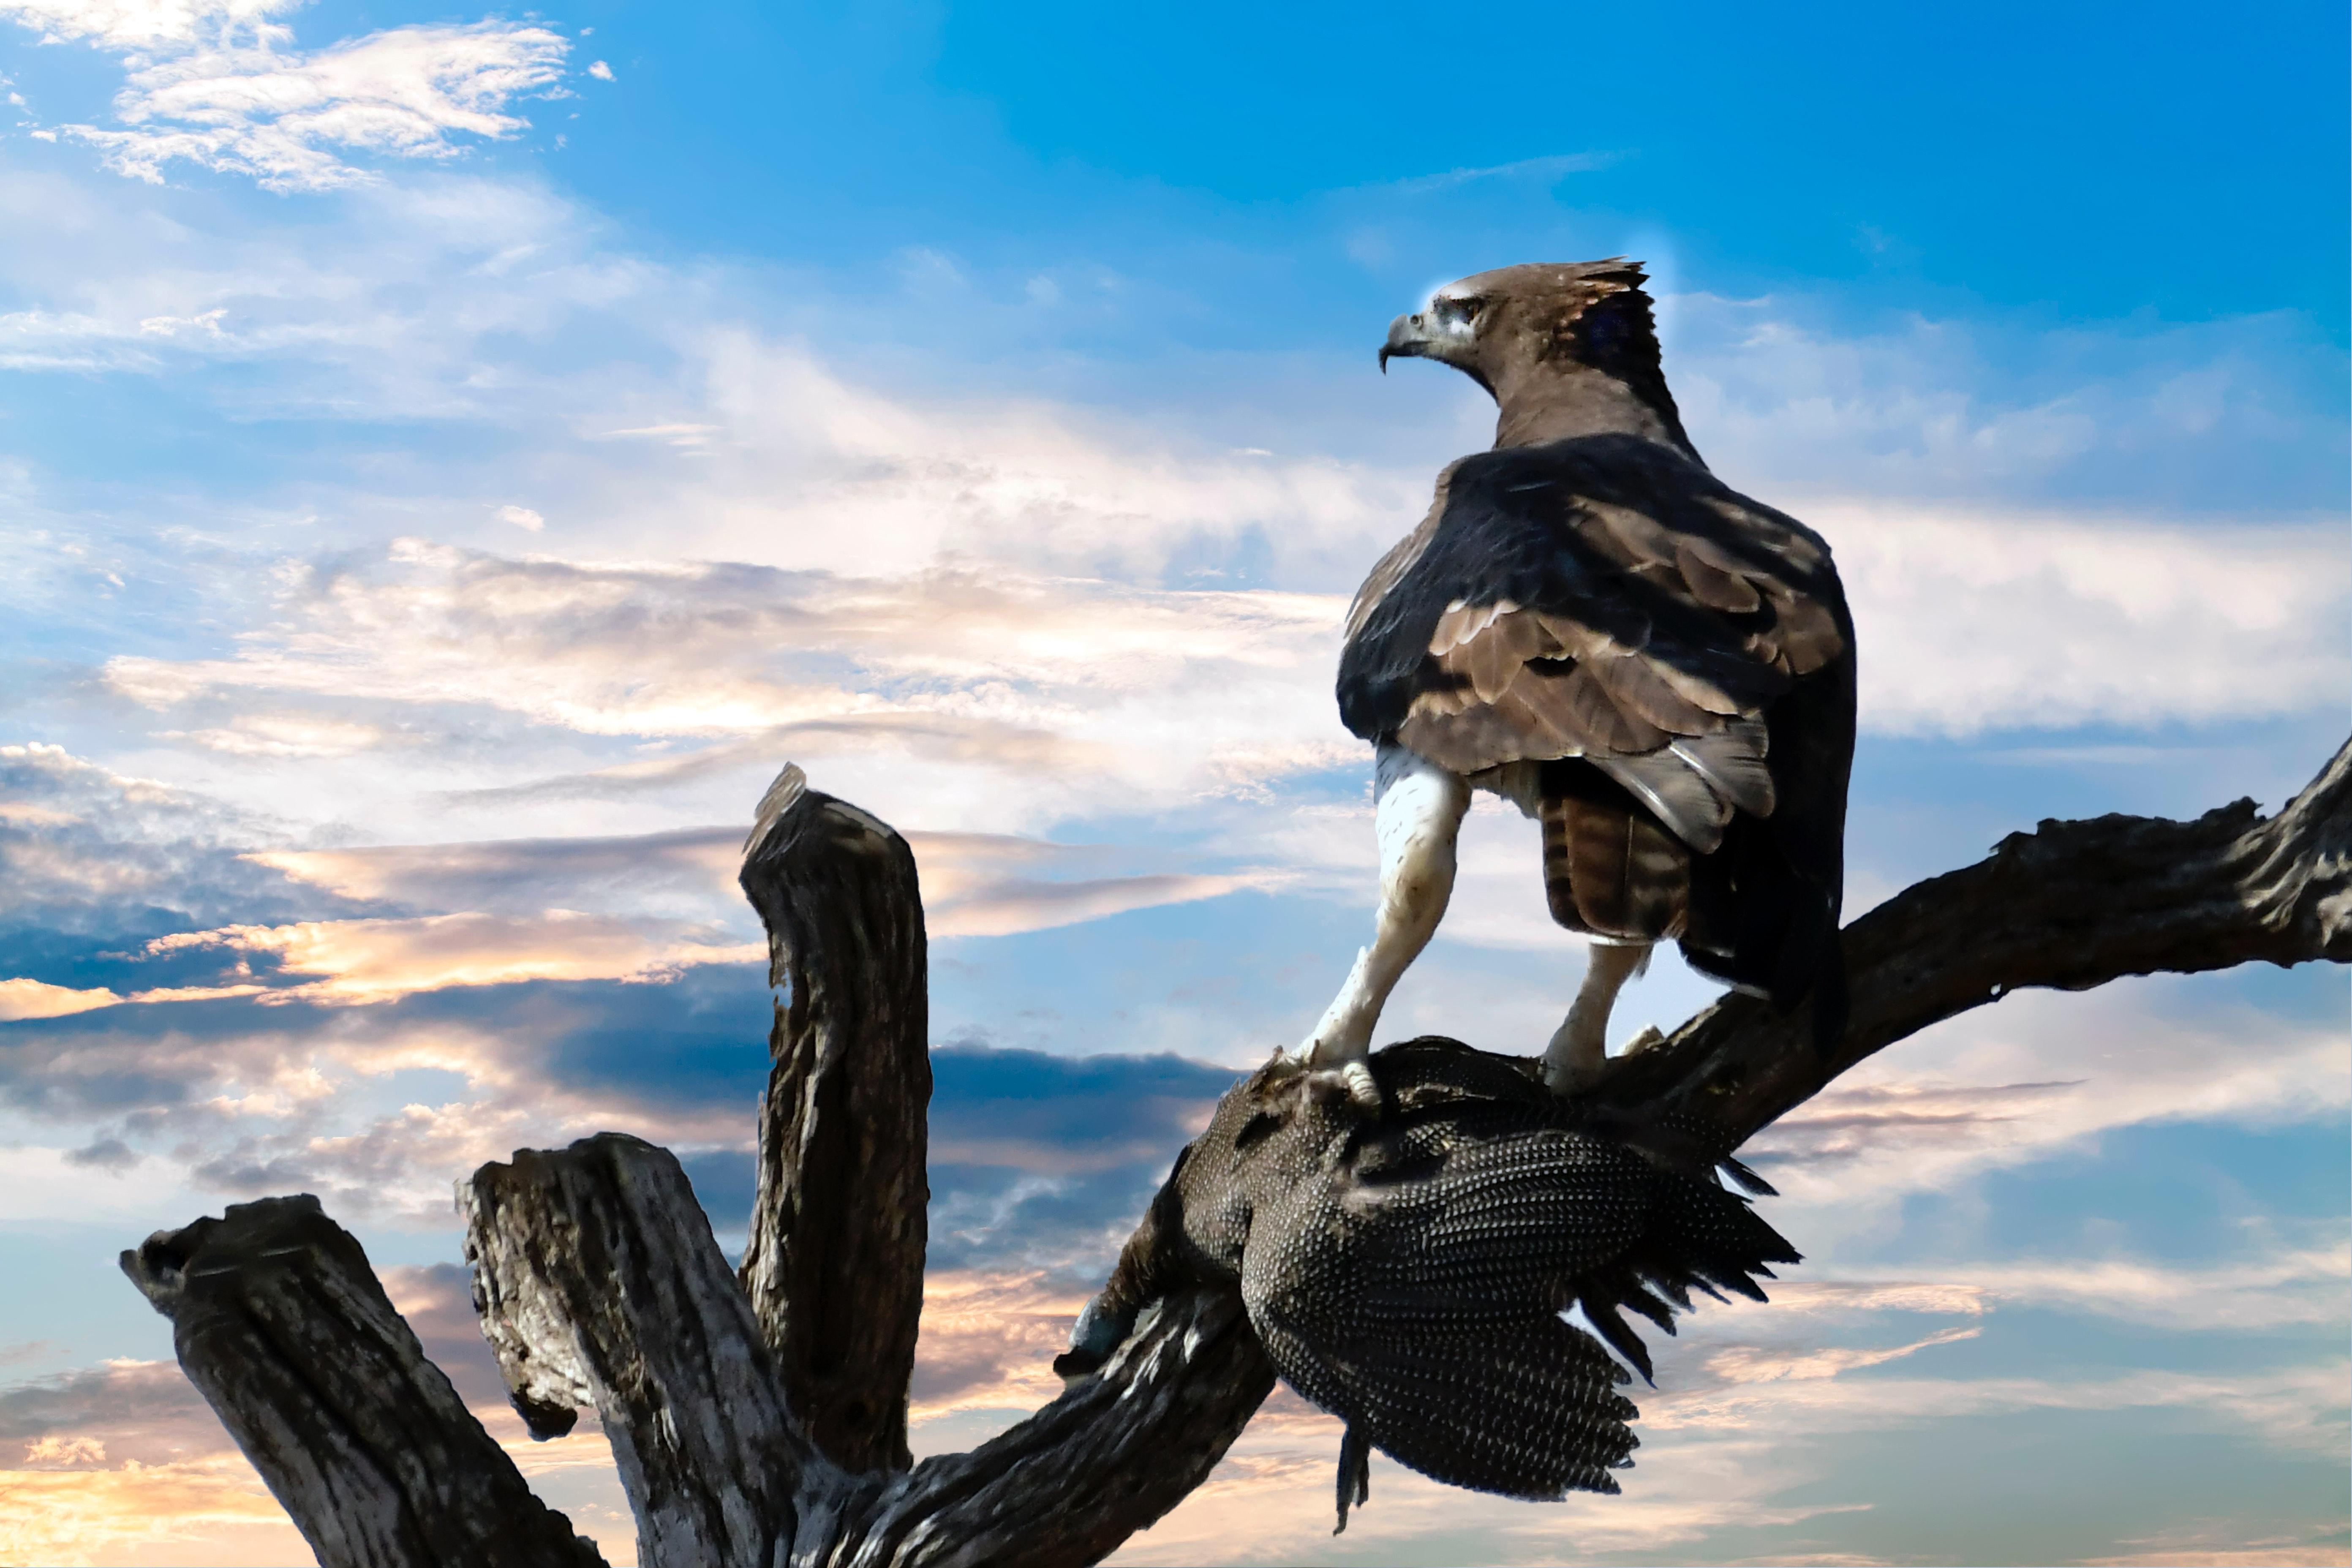 Eagle Perched on Tree Branch, Animal, Landscape, Wildlife, Wild bird, HQ Photo